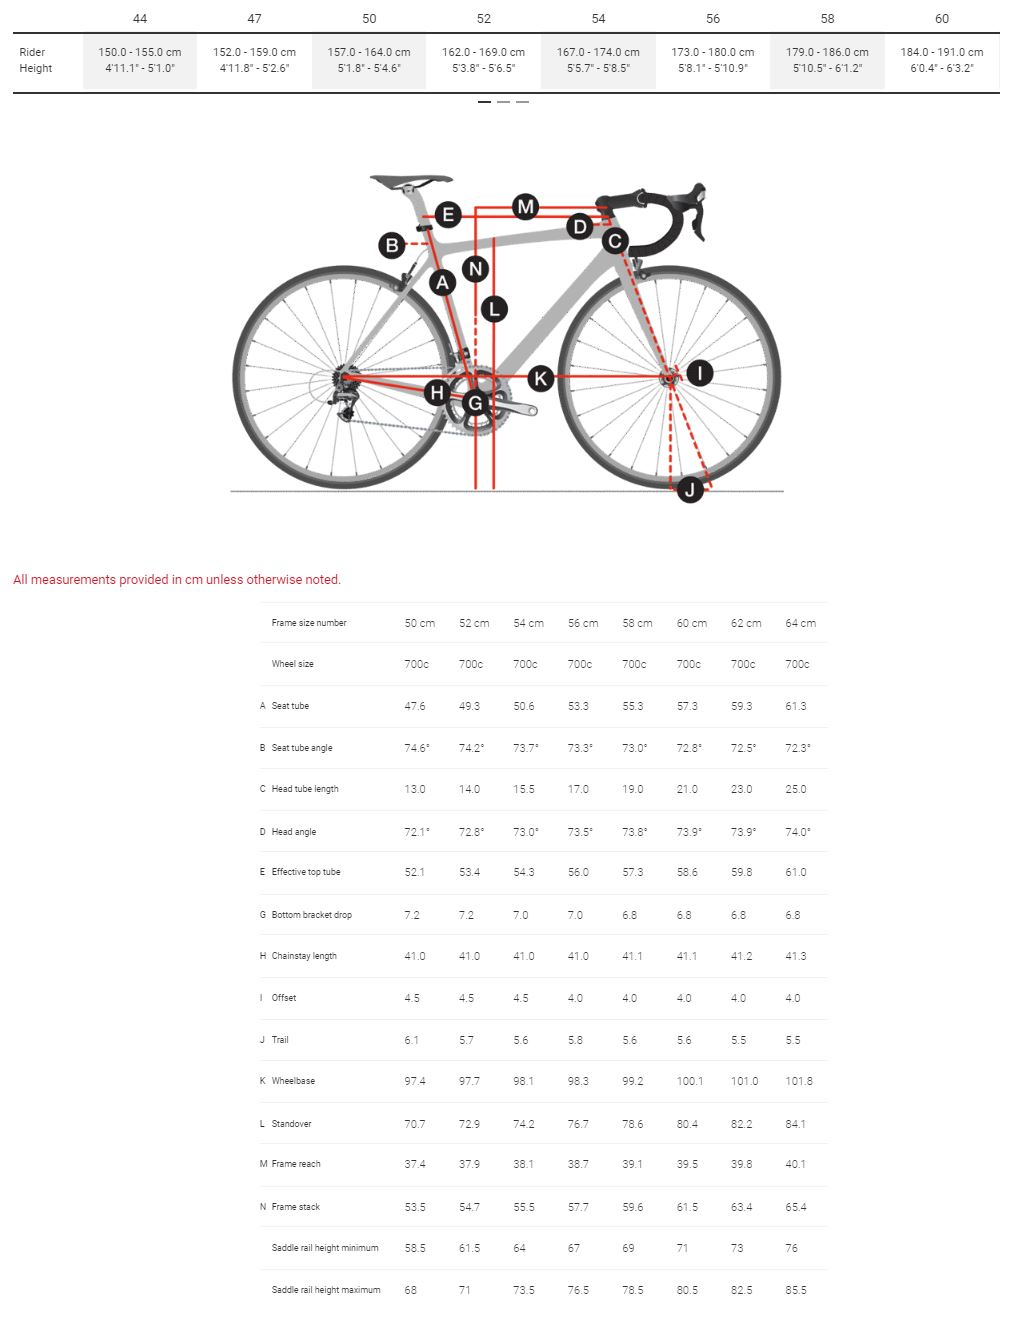 Trek Emonda SL6 geometry chart